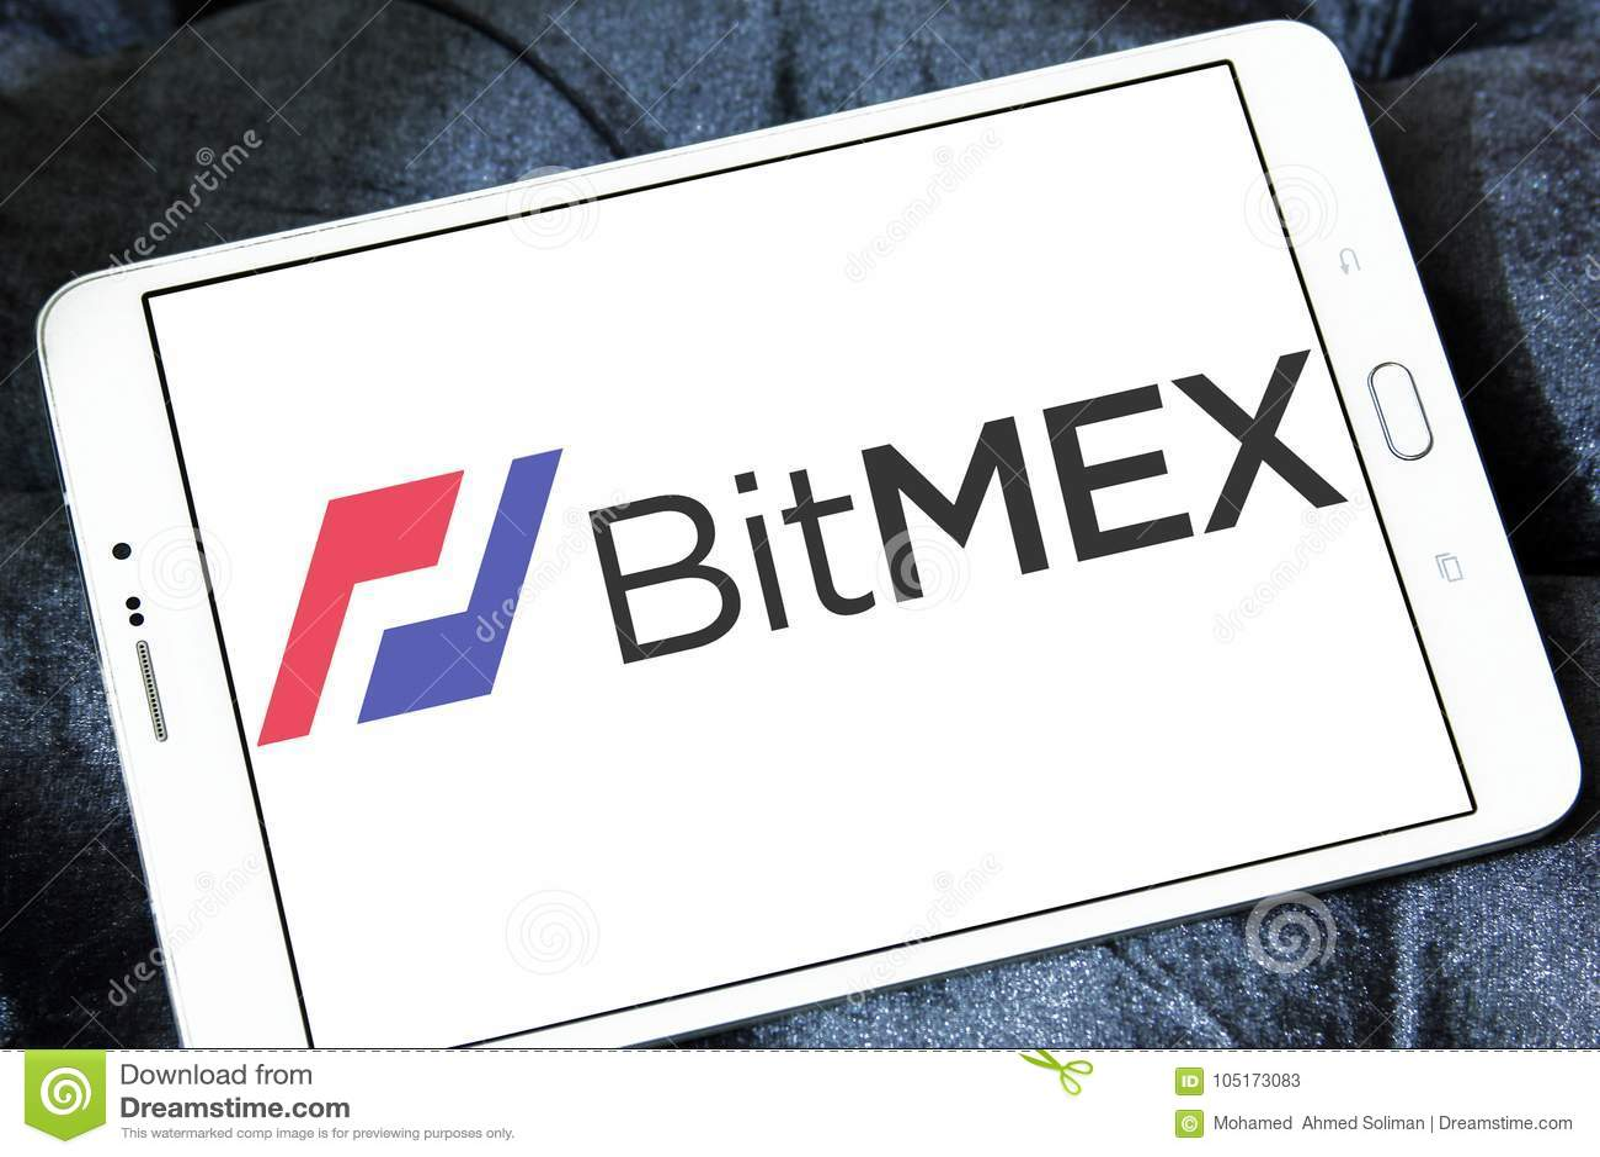 BitMEX Cryptocurrency Exchange Logo Editorial Stock Photo - Image of